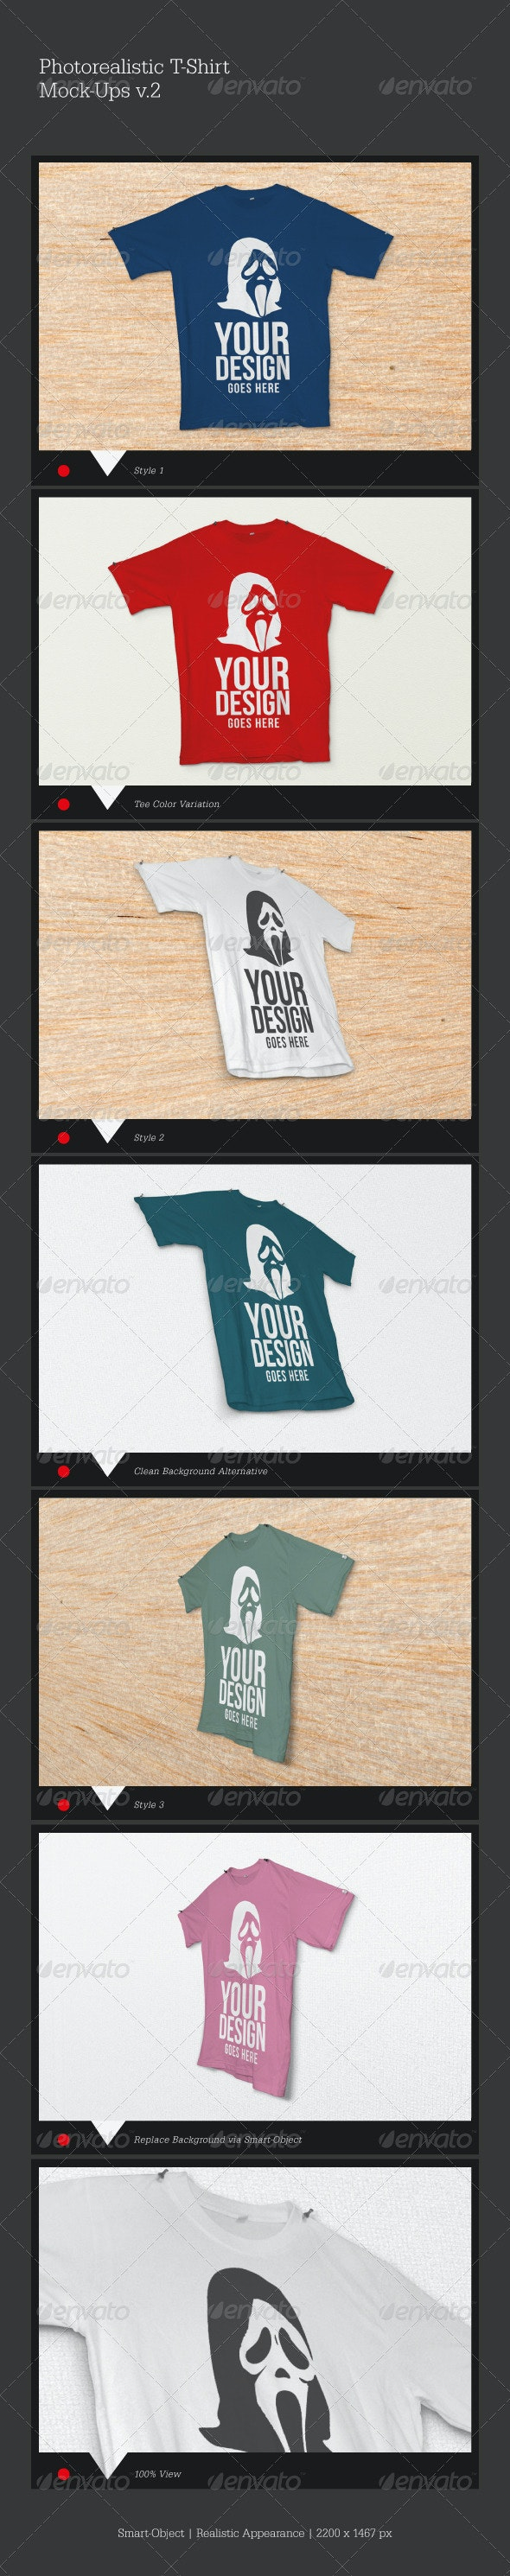 Photorealistic T-Shirt Mock-Ups - T-shirts Apparel